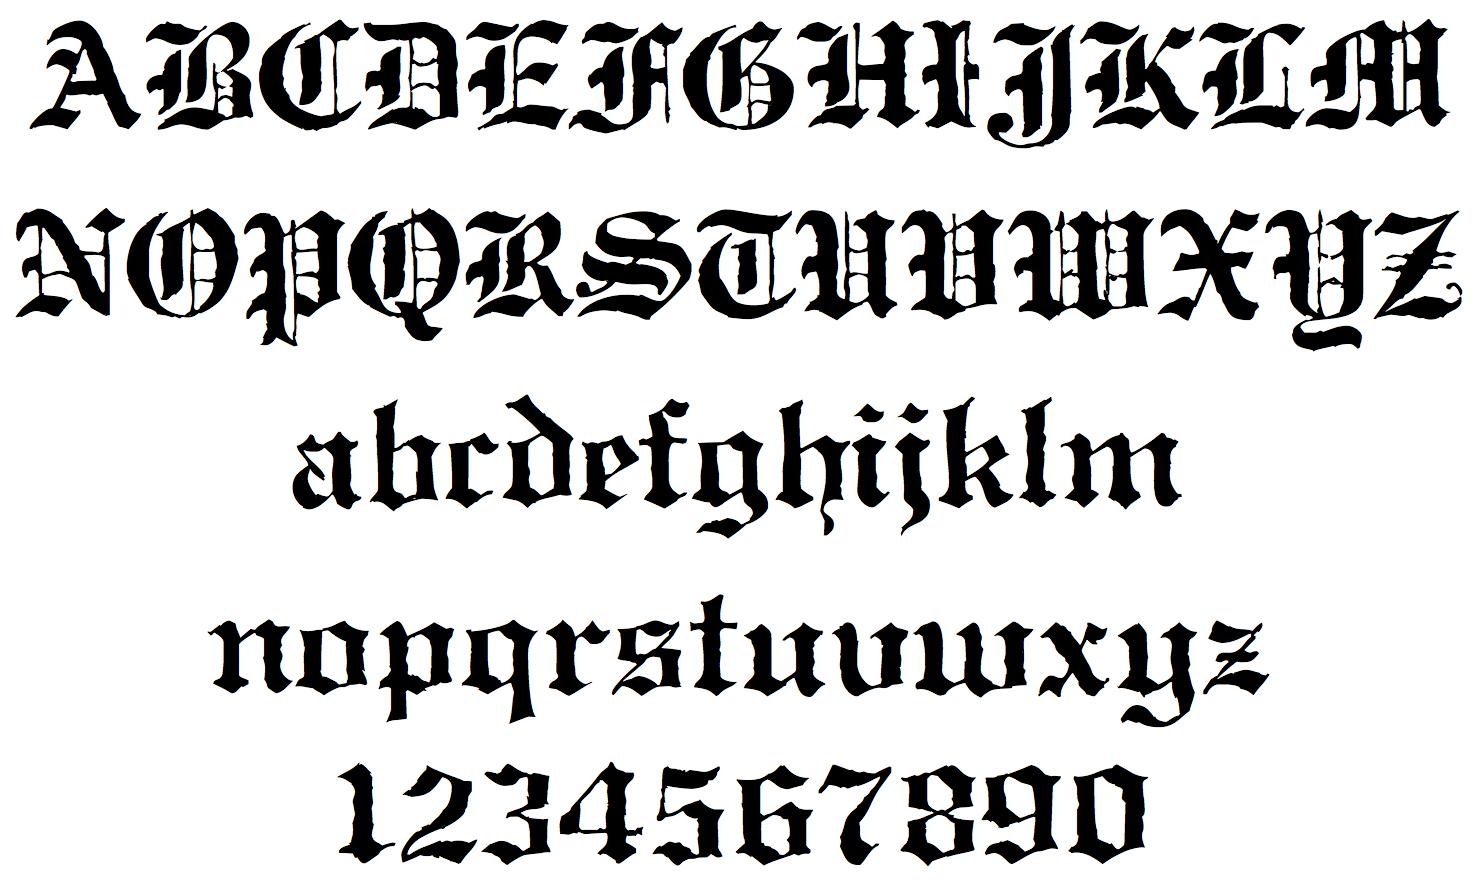 Gothic Calligraphy Font Images Alphabet